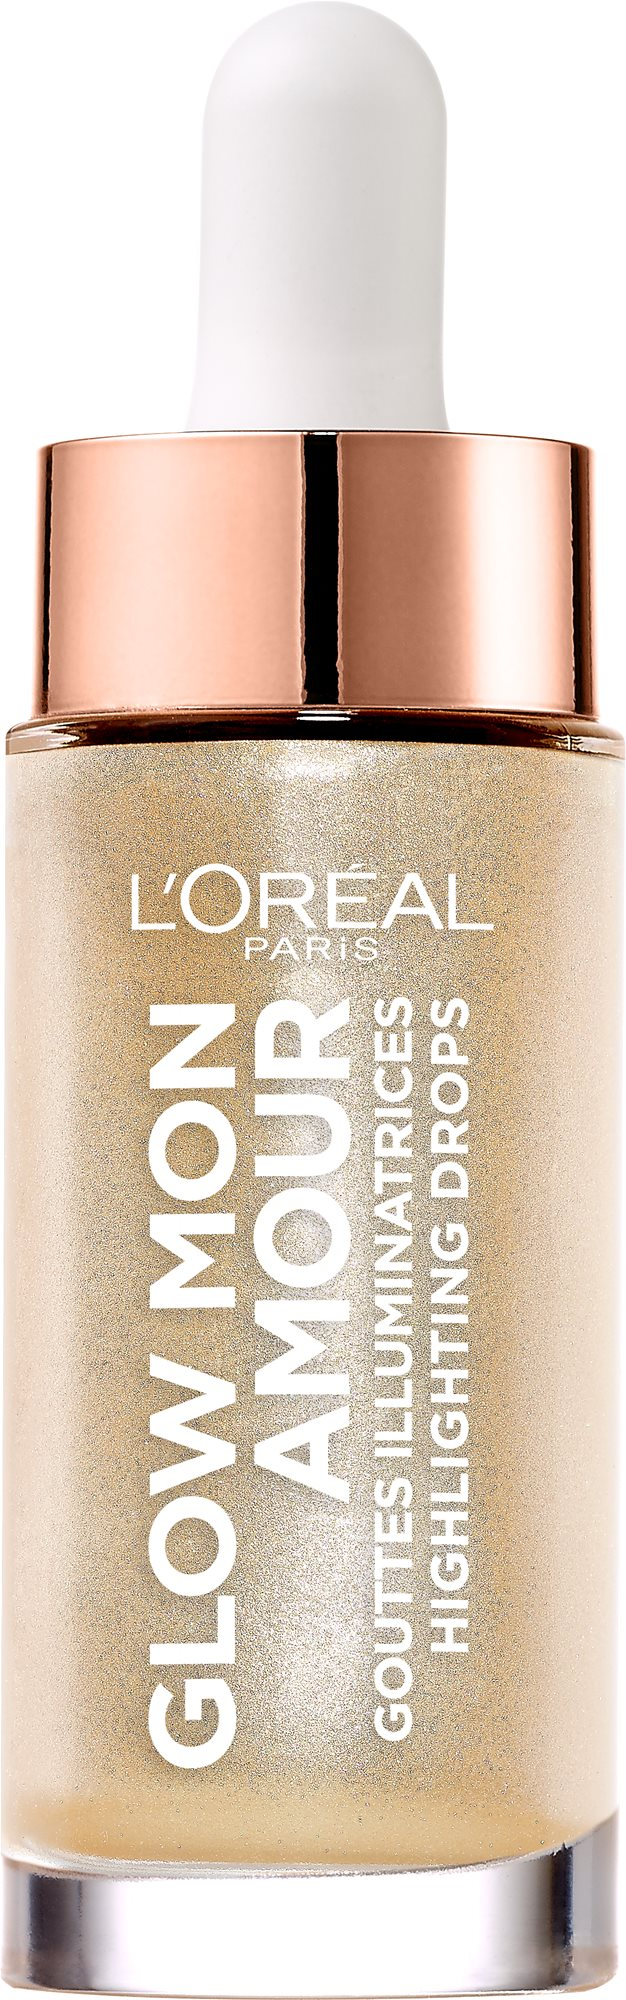 ĽORÉAL PARIS Wake Up & Glow Mon Amour Highlighting Drops 01 Champagne 15 ml